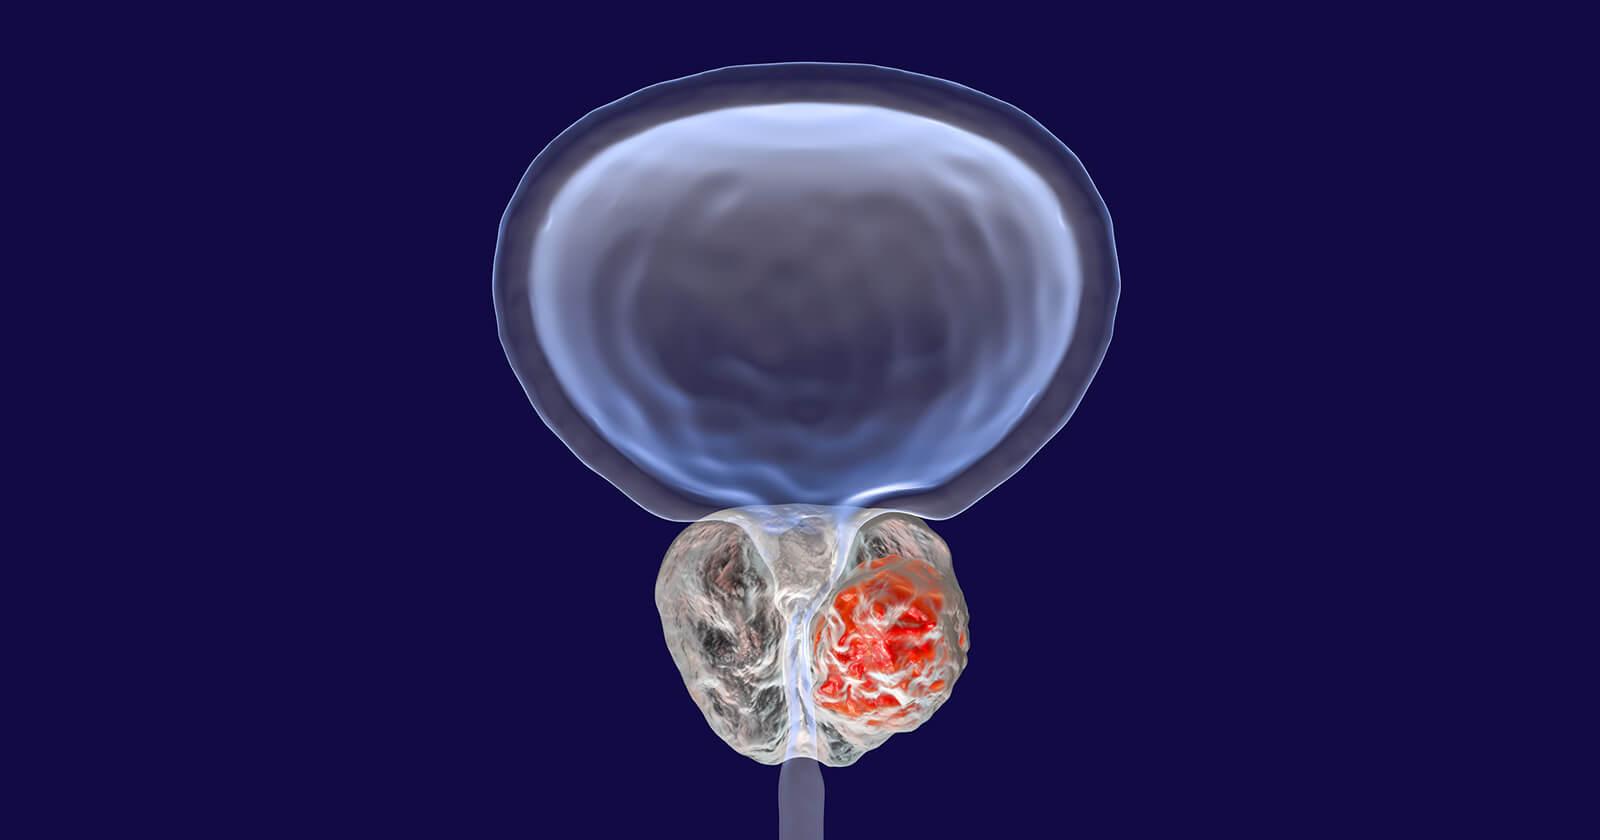 Prostatavergrößerung: Ursachen, Symptome, Behandlung & OP ...